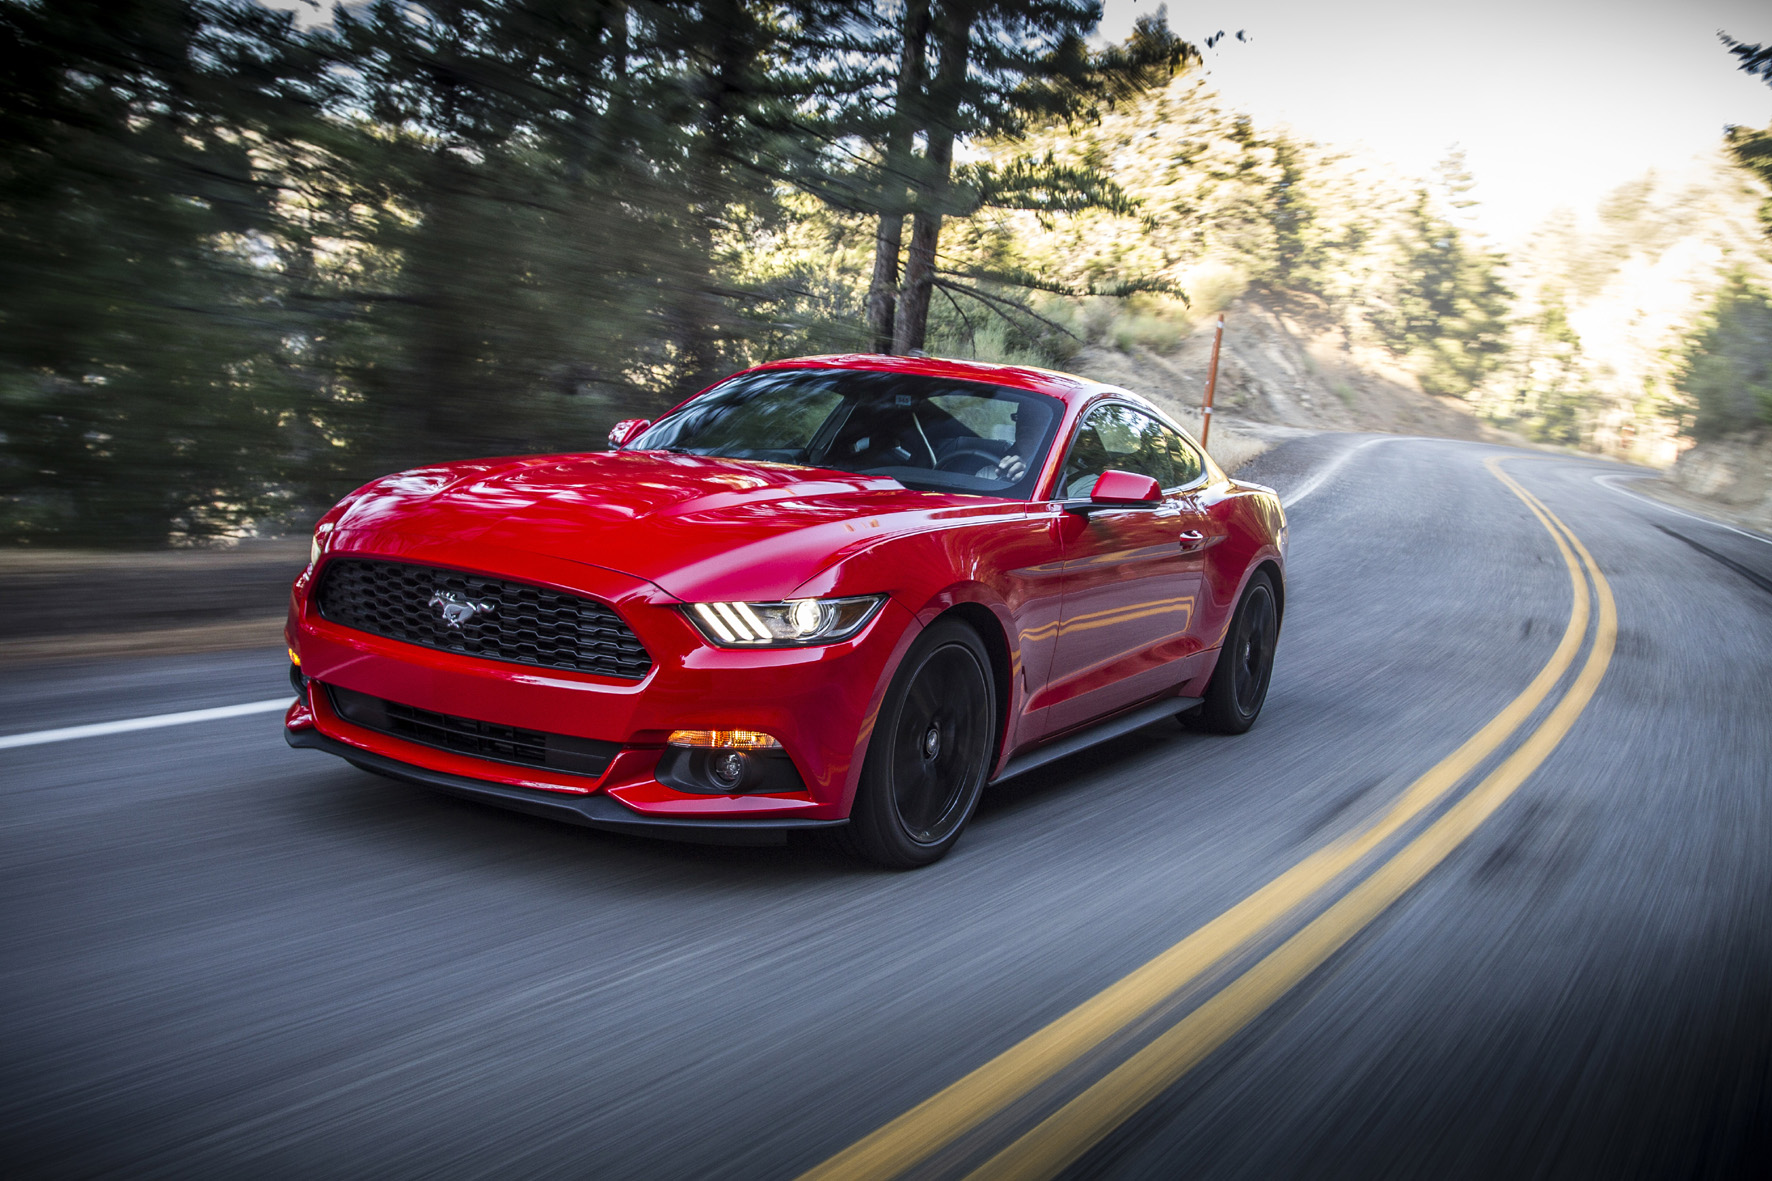 Ford Mustang galoppiert zum Preis-Leistungs-Sieg